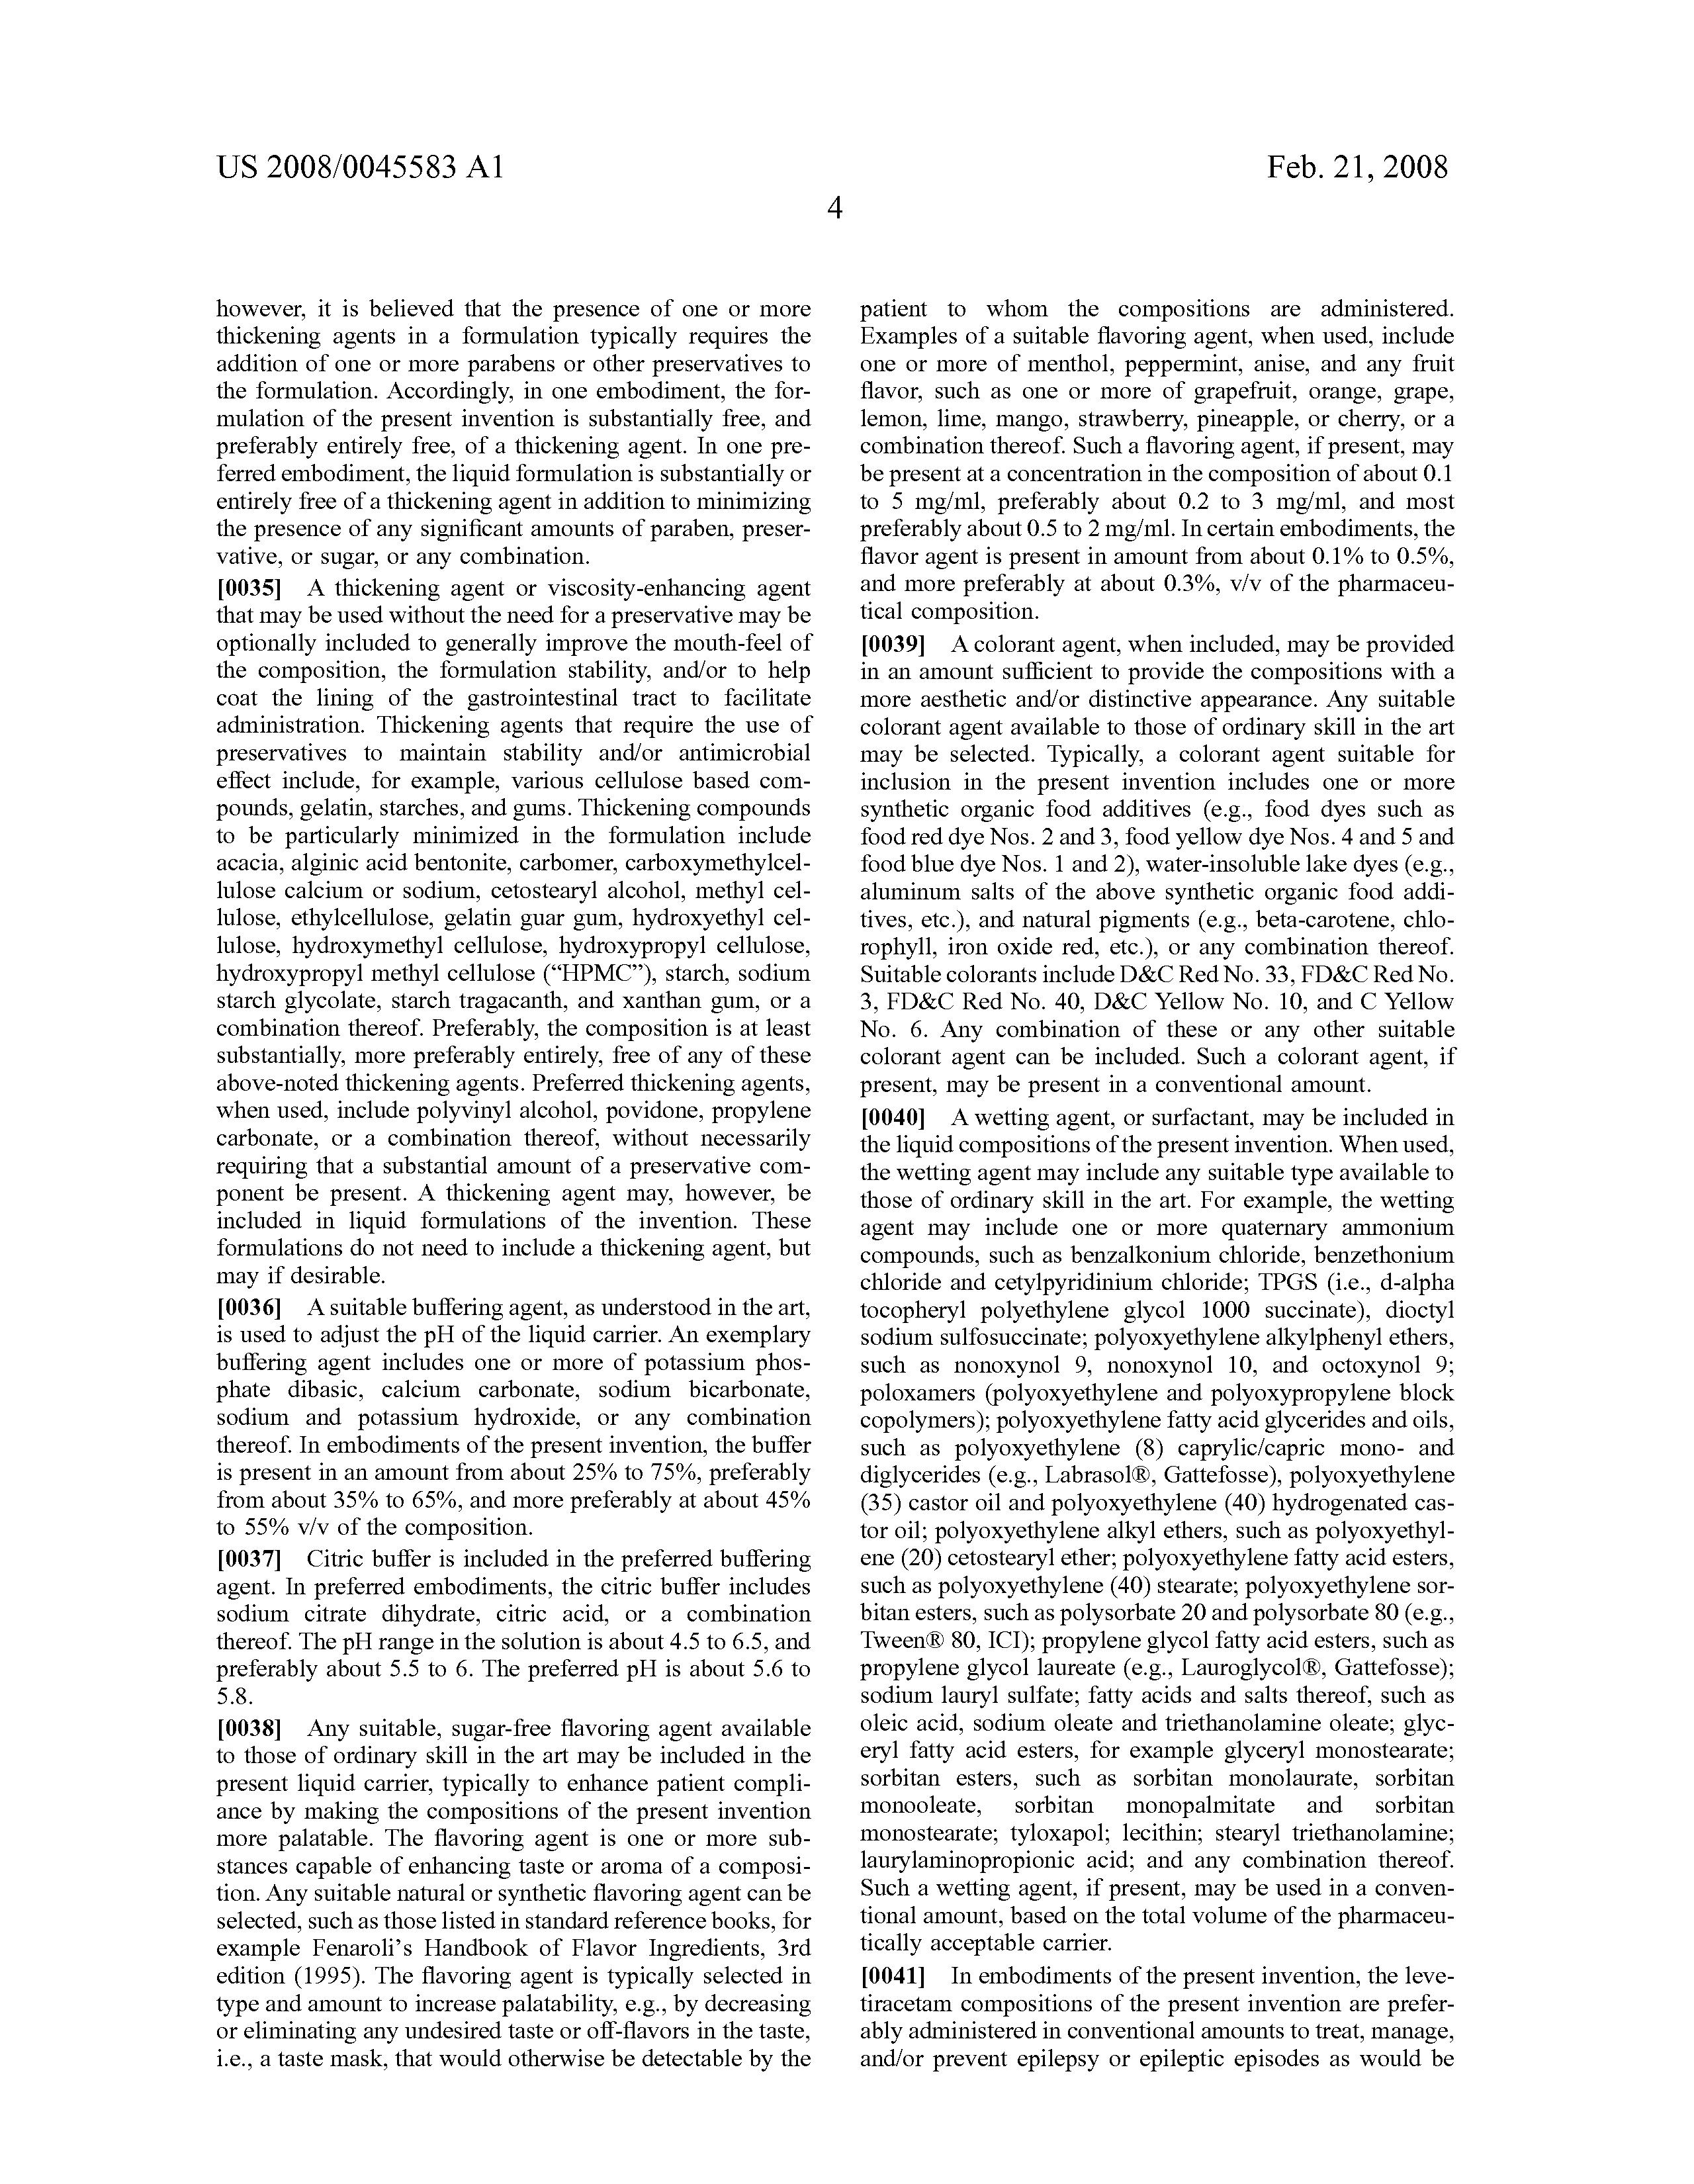 Dr. MURALI K SURAPANENI – INTERNAL MEDICINE